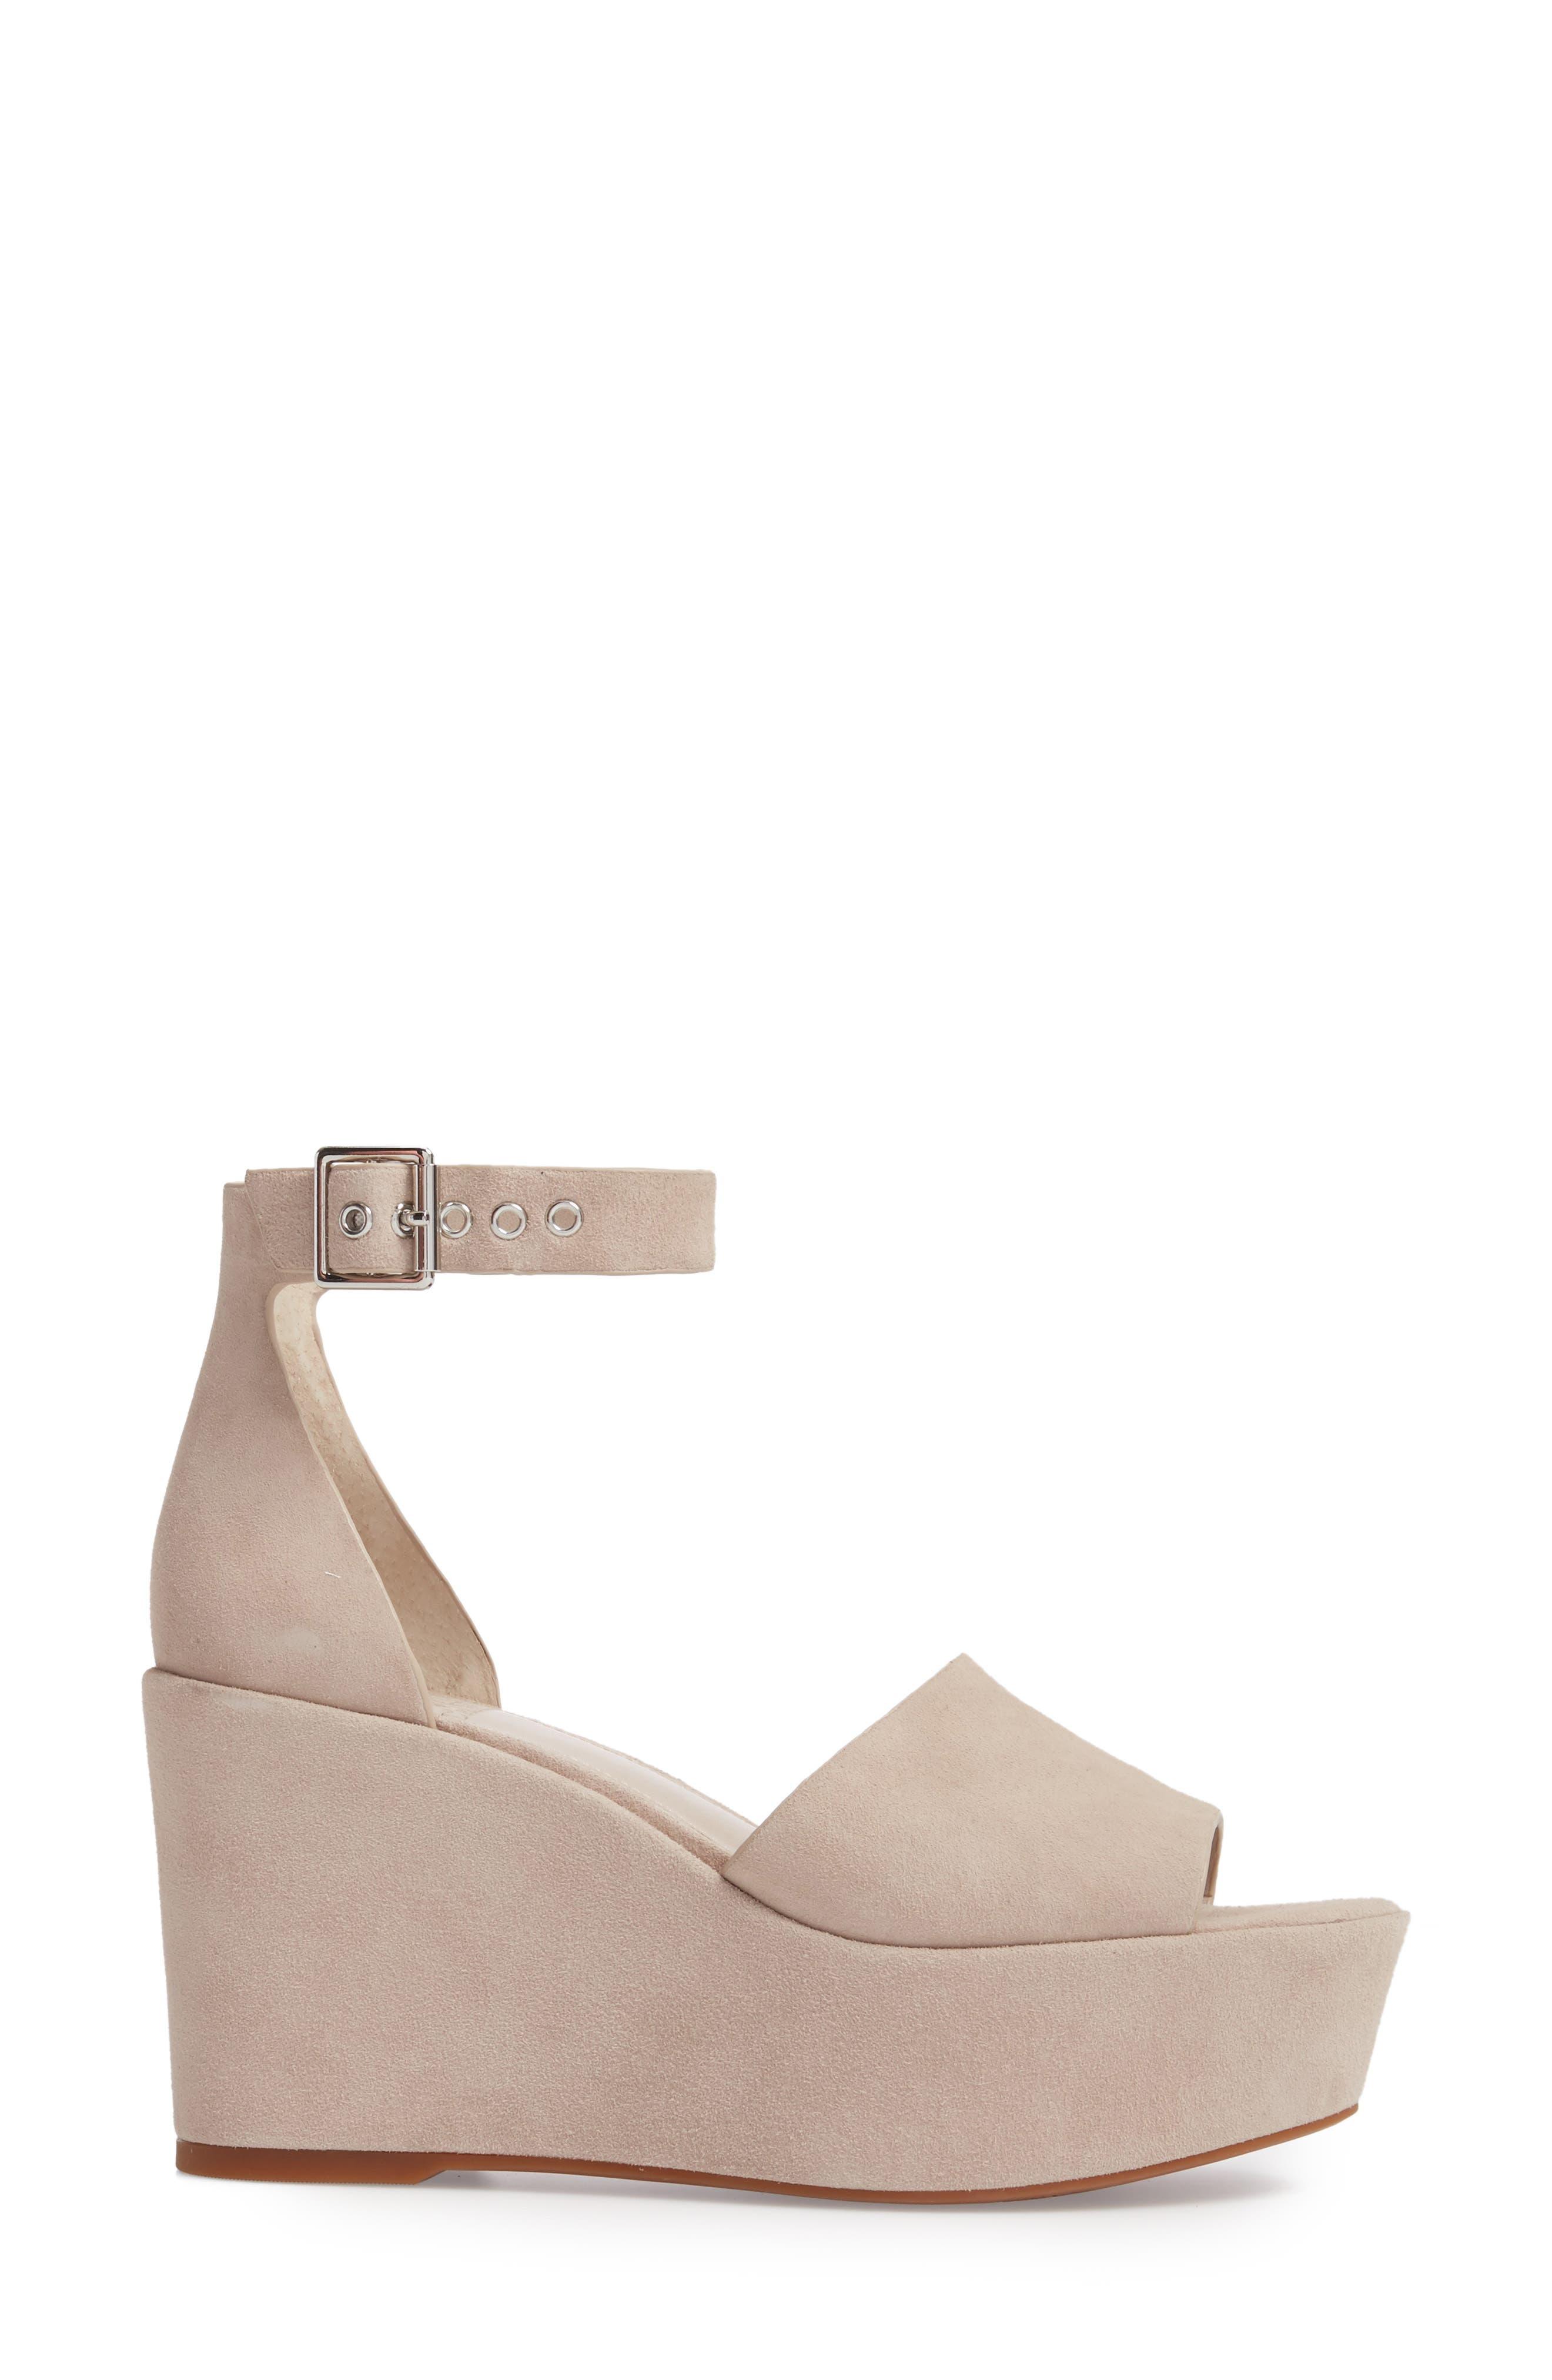 Korista Platform Sandal,                             Alternate thumbnail 3, color,                             Tipsy Taupe Suede